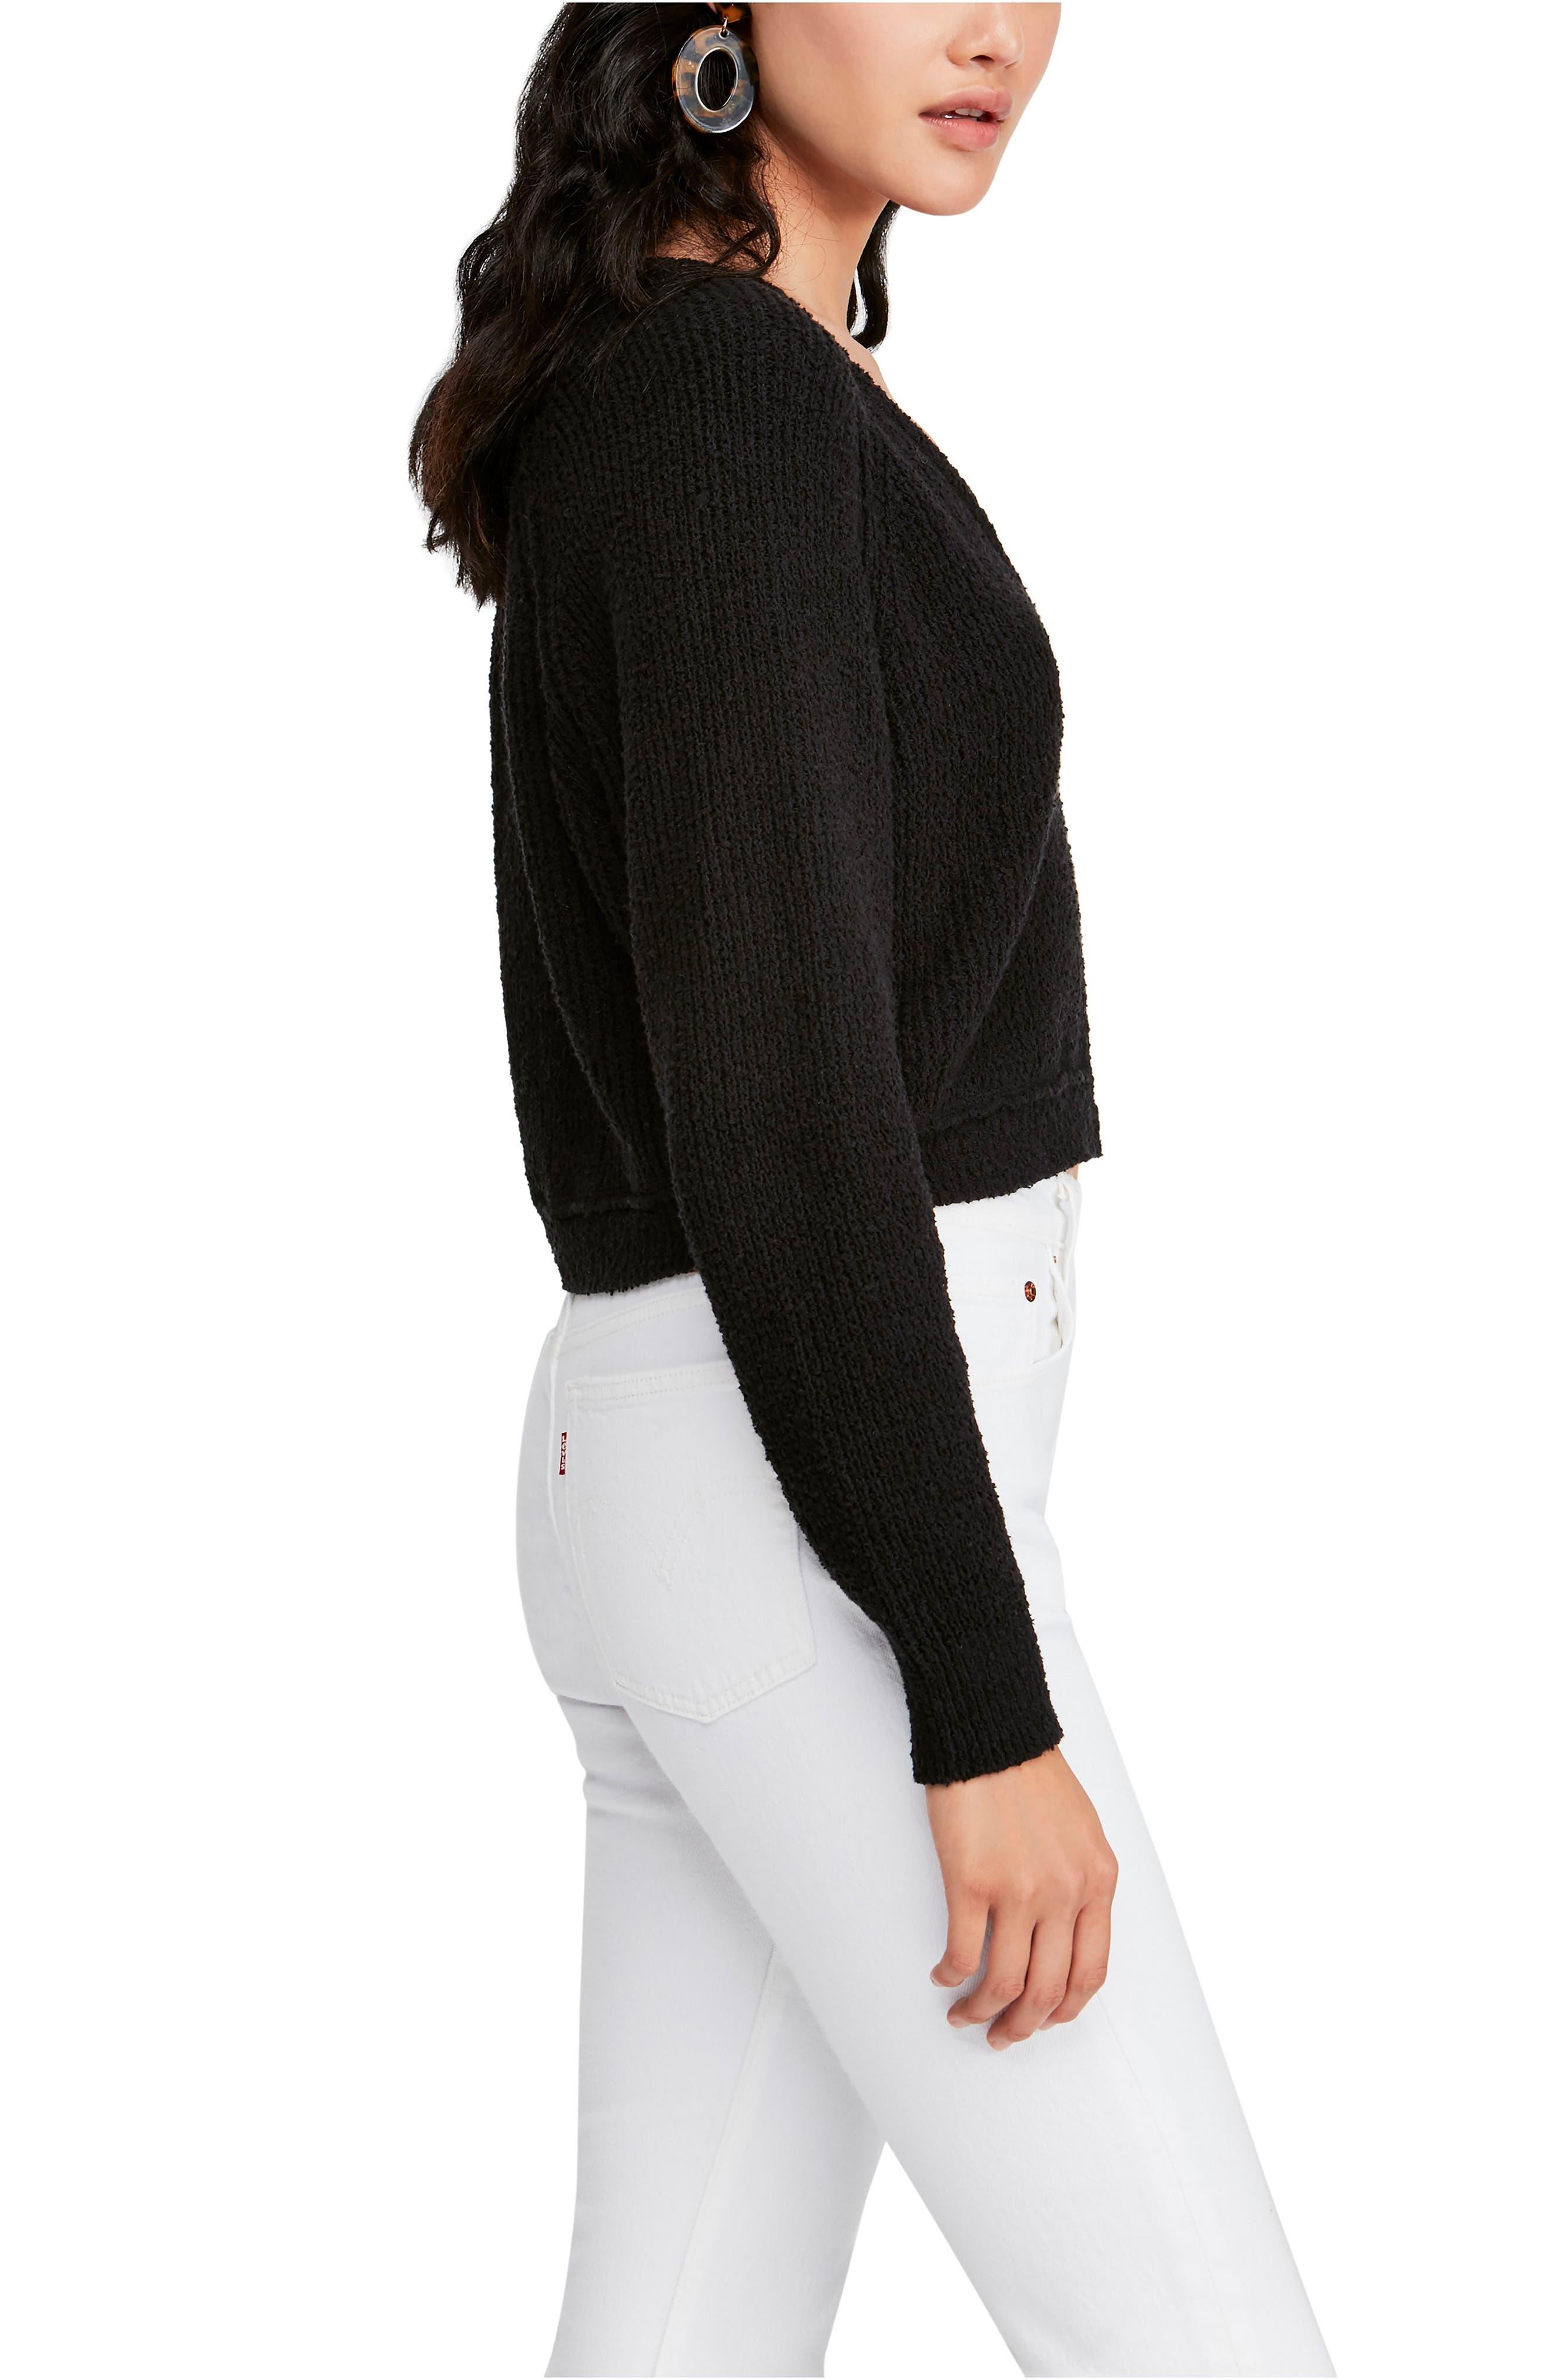 FREE PEOPLE,                             V-Neck Sweater,                             Alternate thumbnail 3, color,                             BLACK